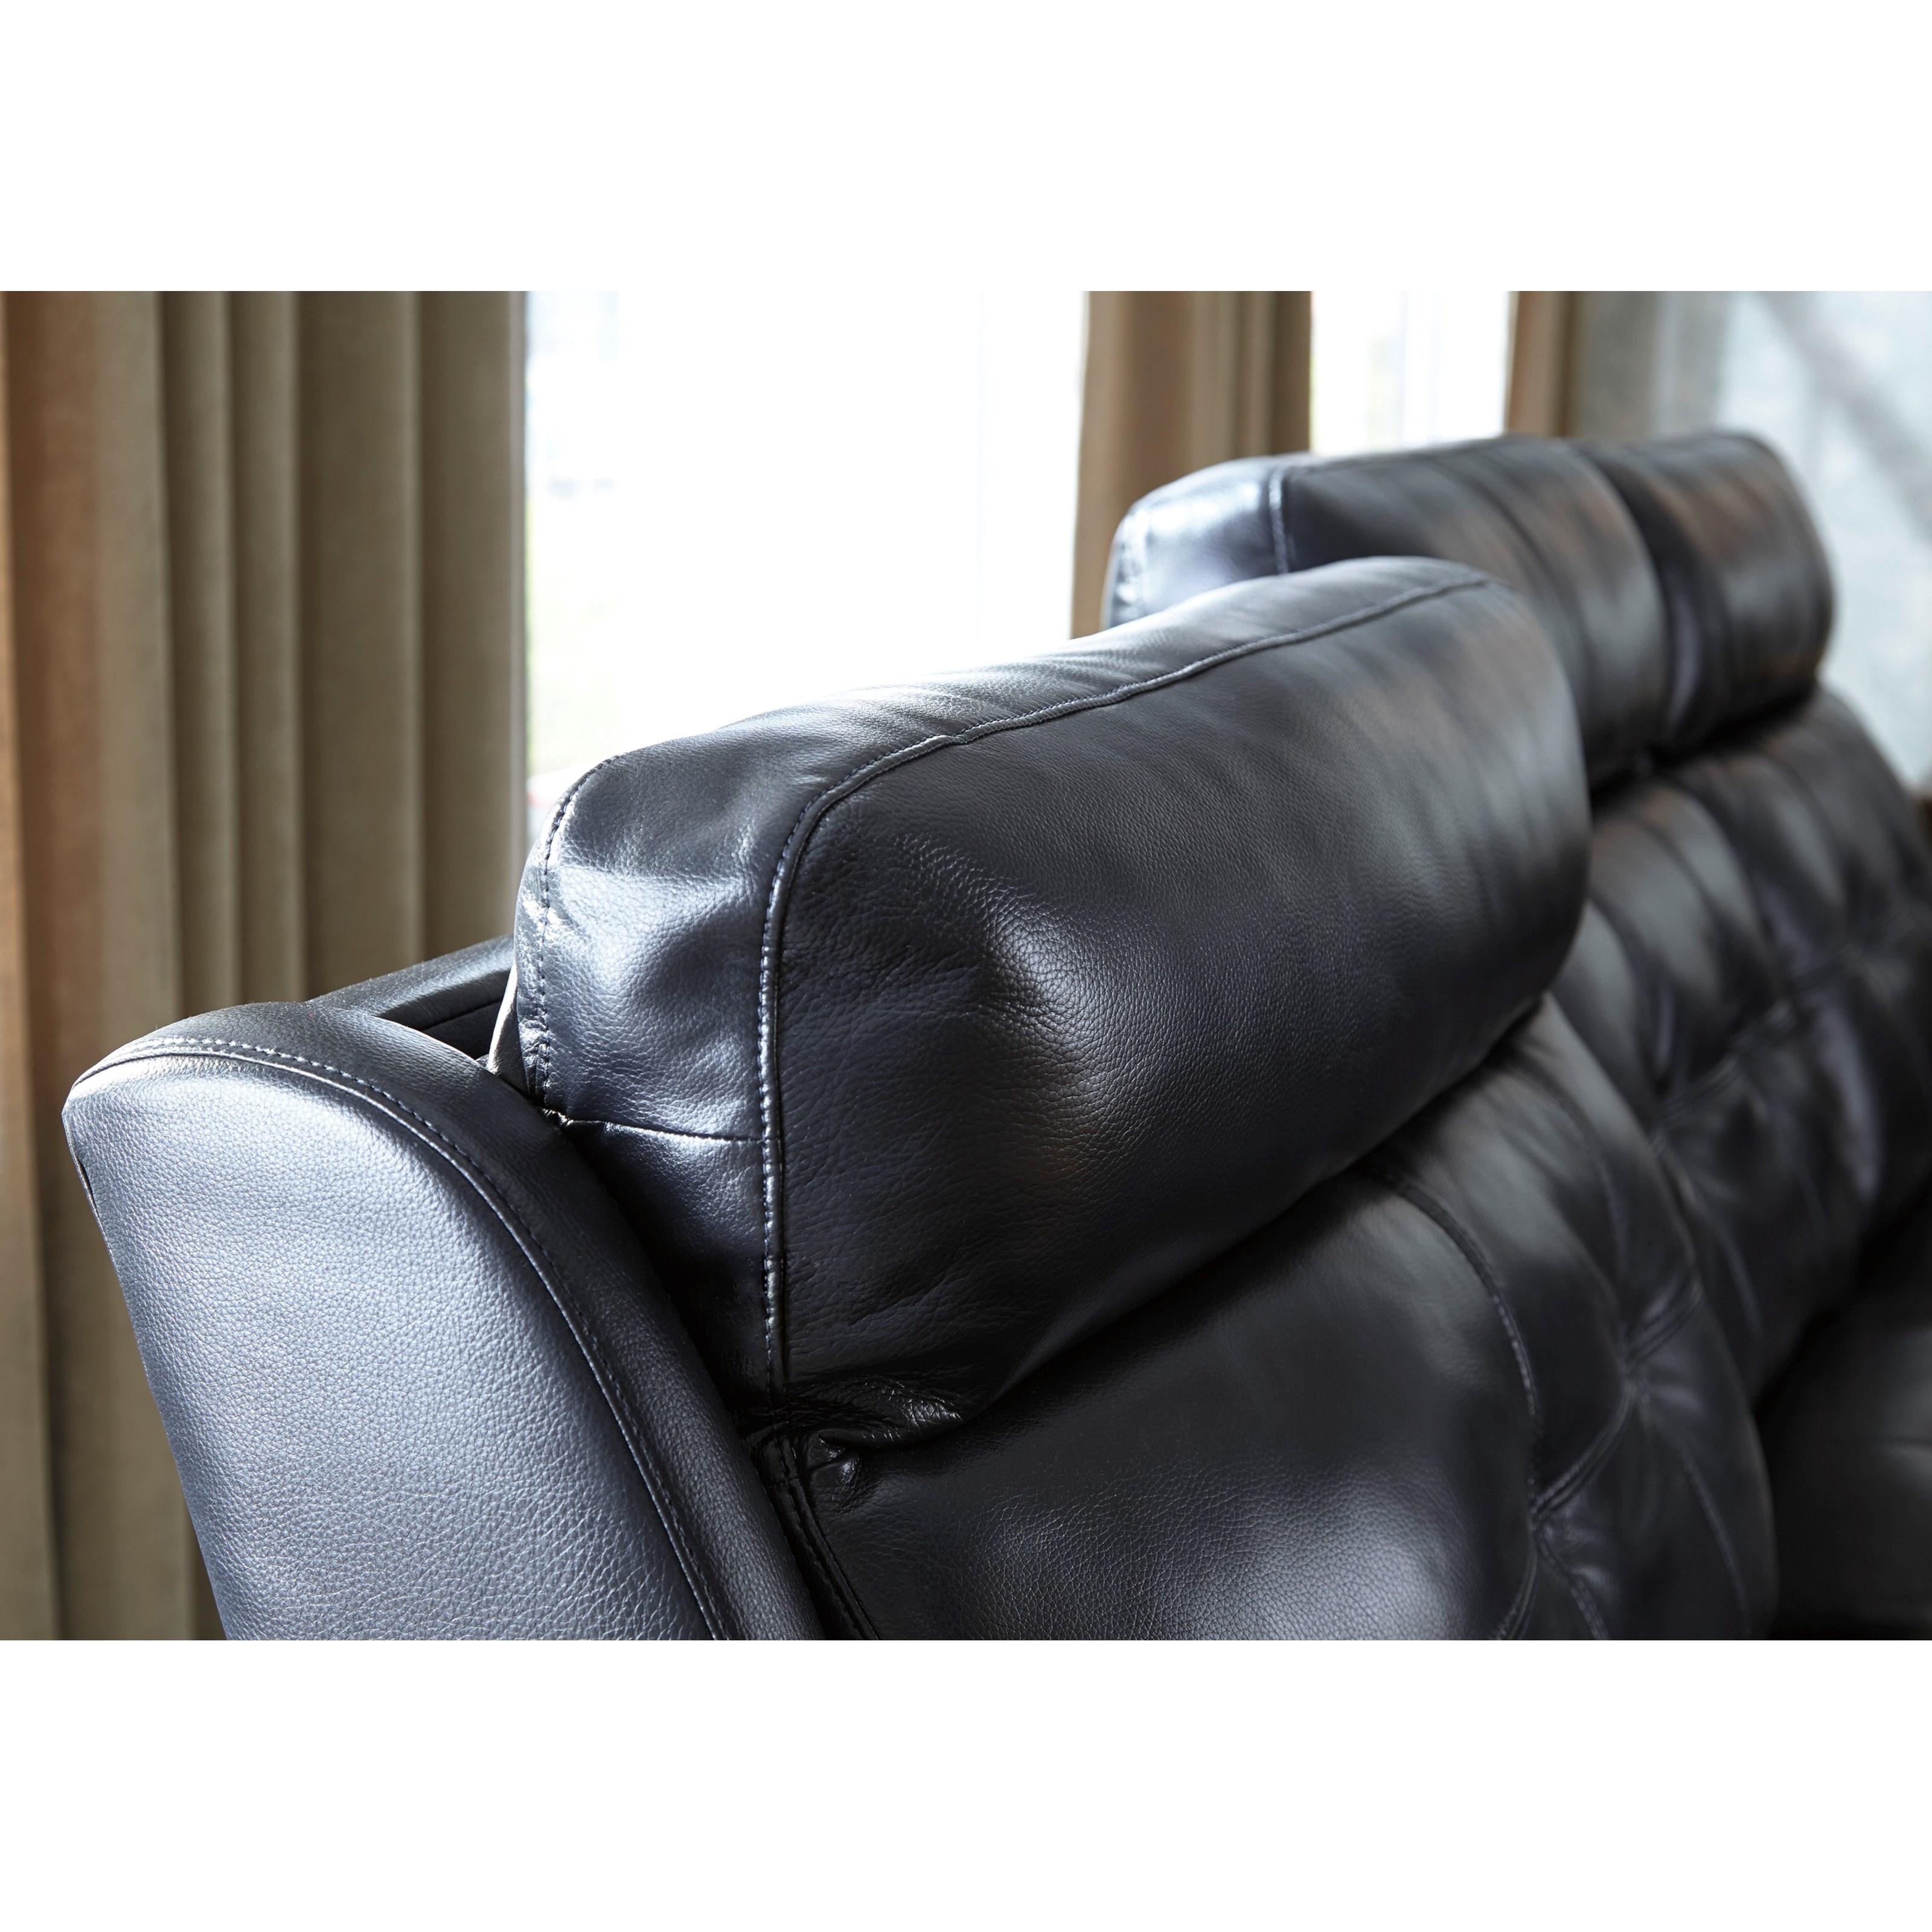 Superbe Power Reclining Sofa W/ Adjustable Headrest